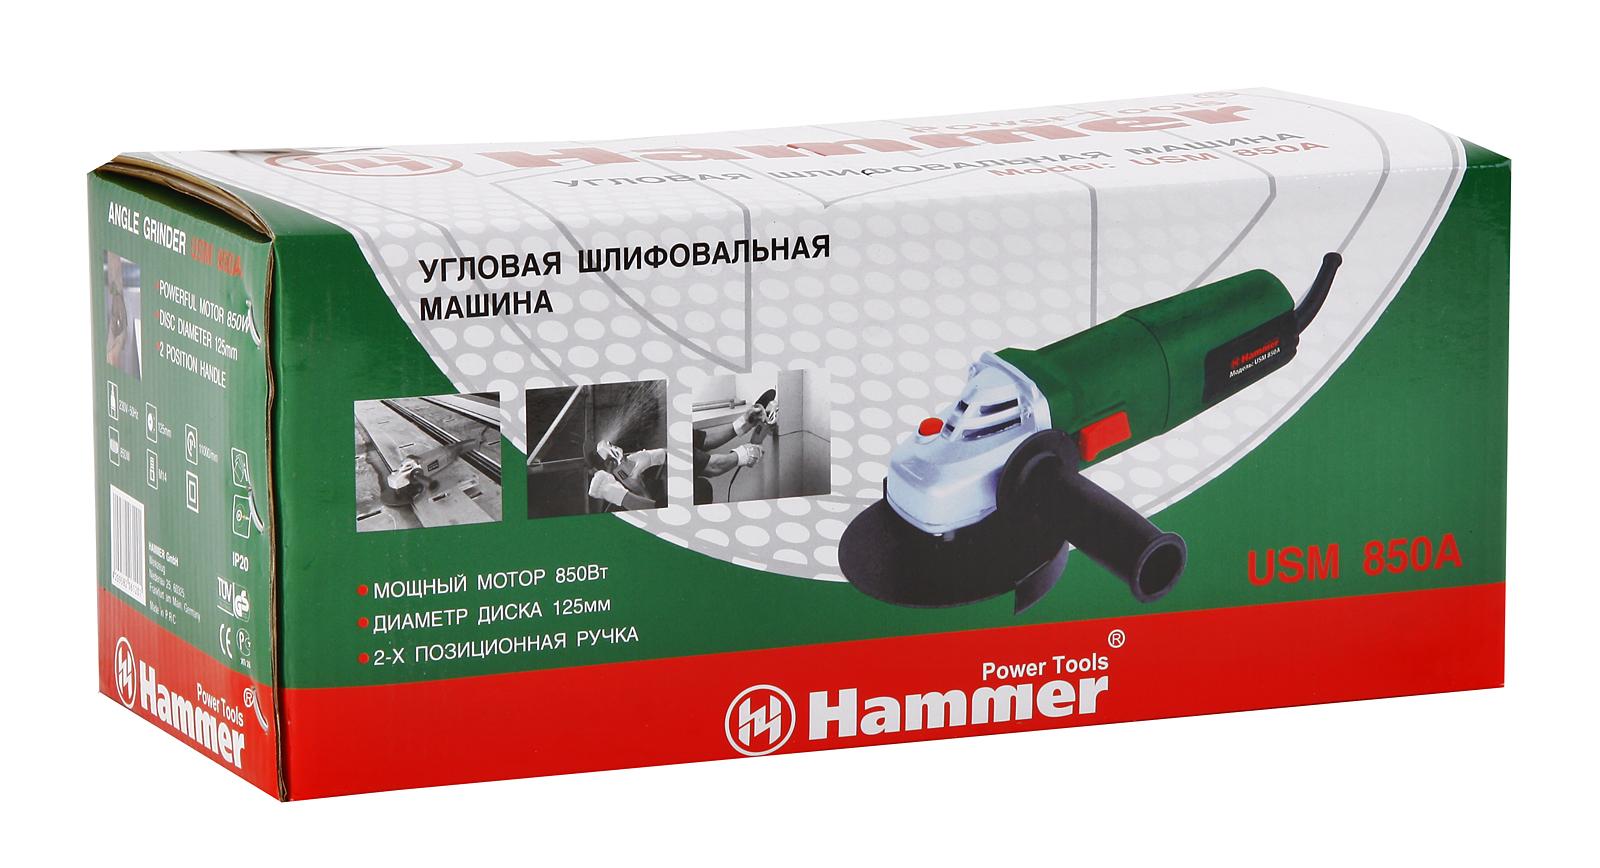 УШМ (болгарка) Hammer Usm850a